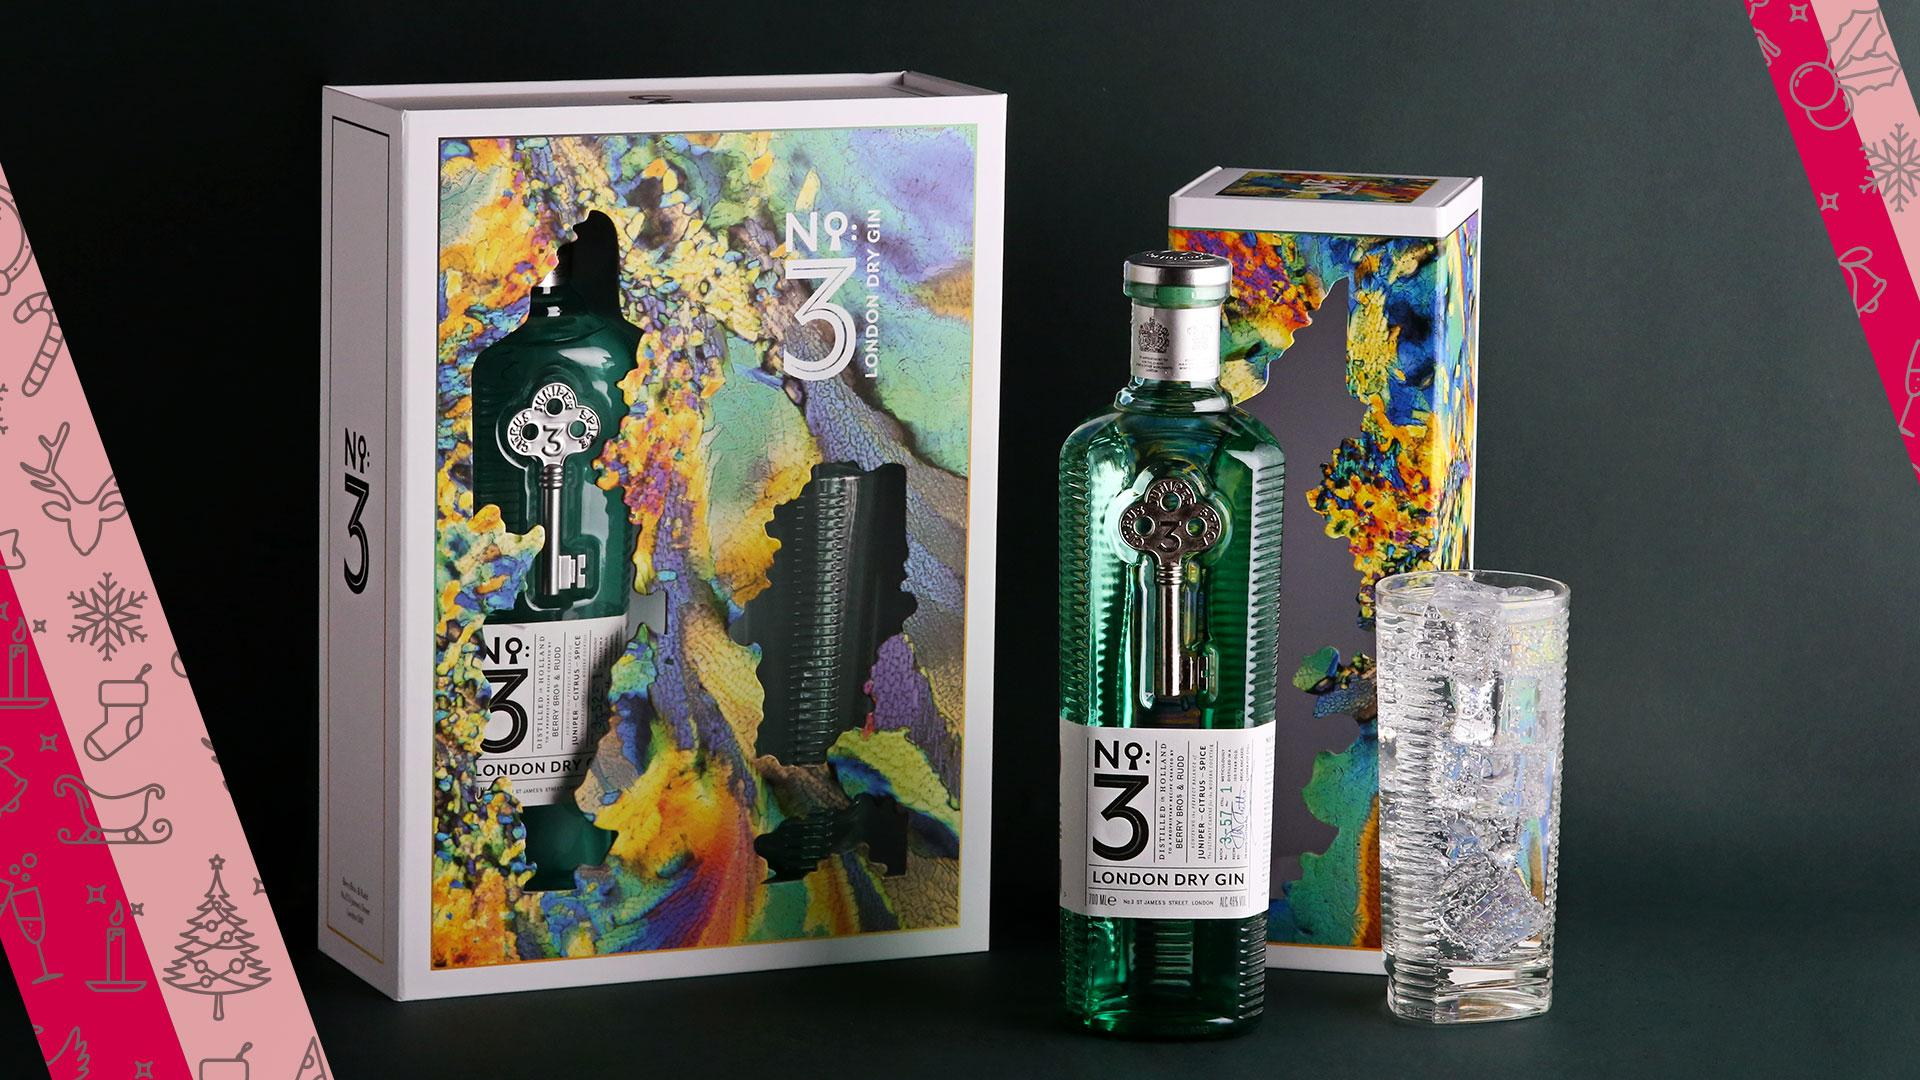 Food and drink Christmas gifts: No3 gin gift set